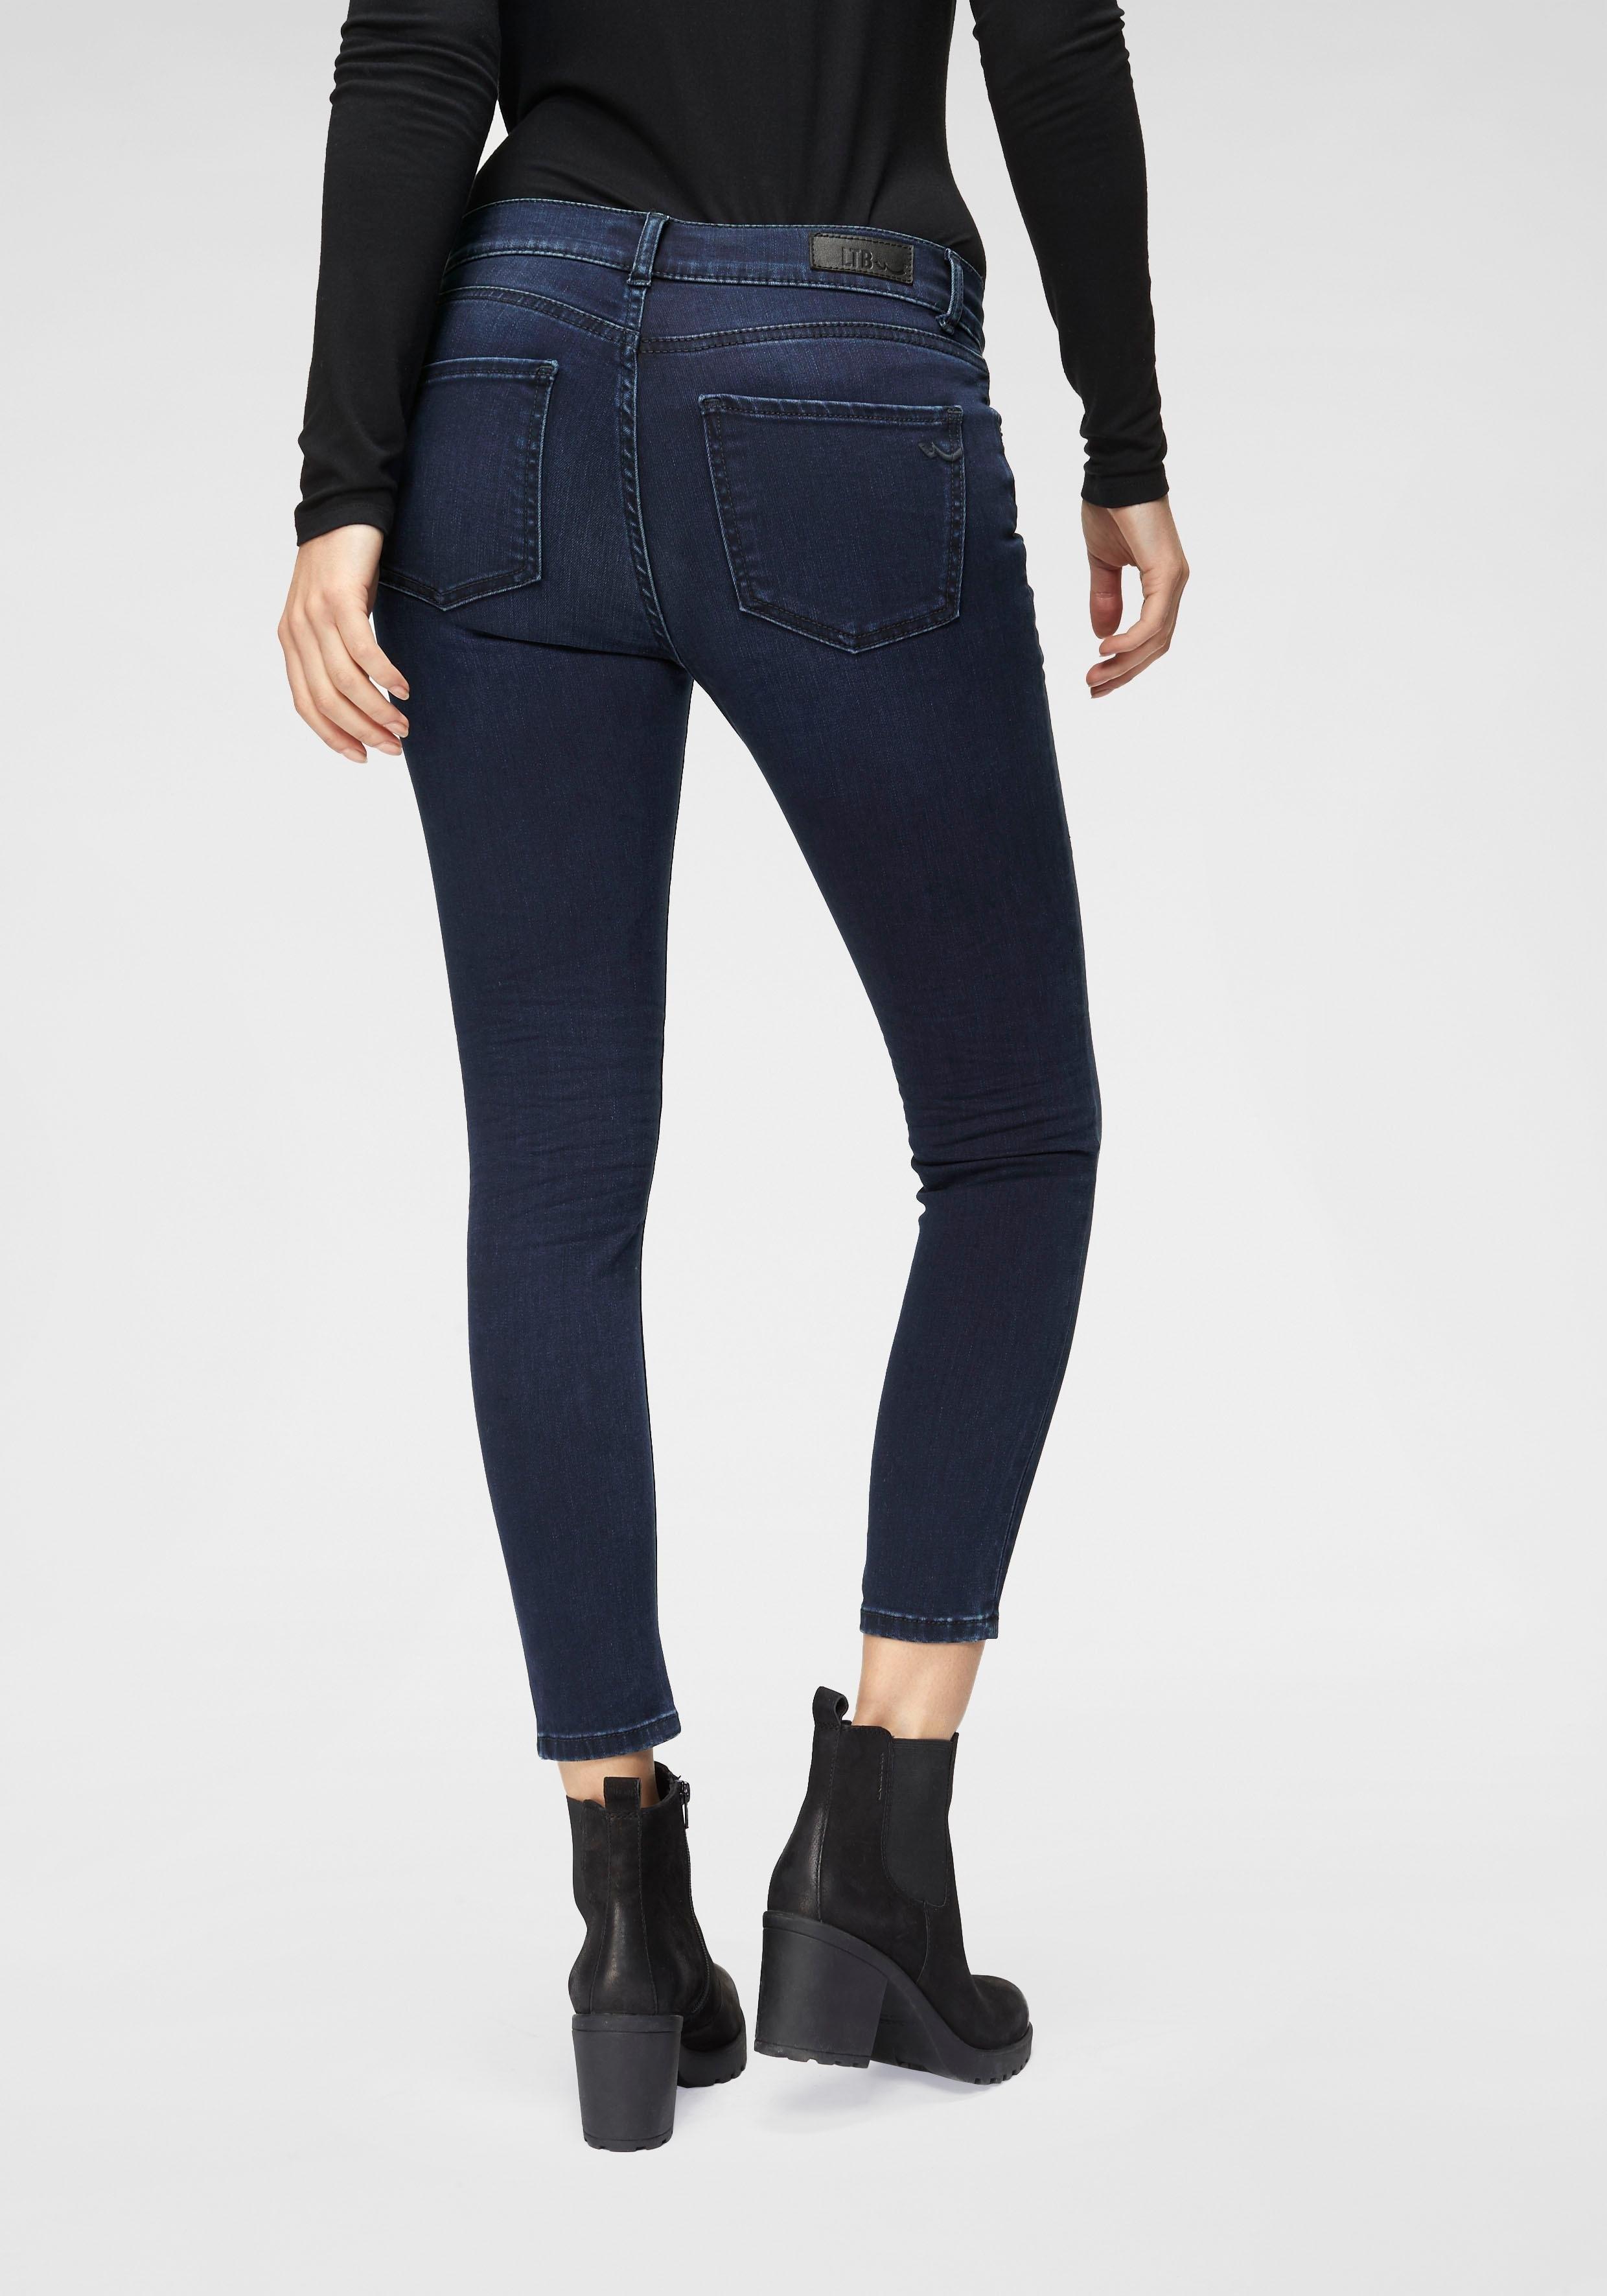 LTB skinny fit jeans LONIA in extra korte cropped lengte nu online kopen bij OTTO